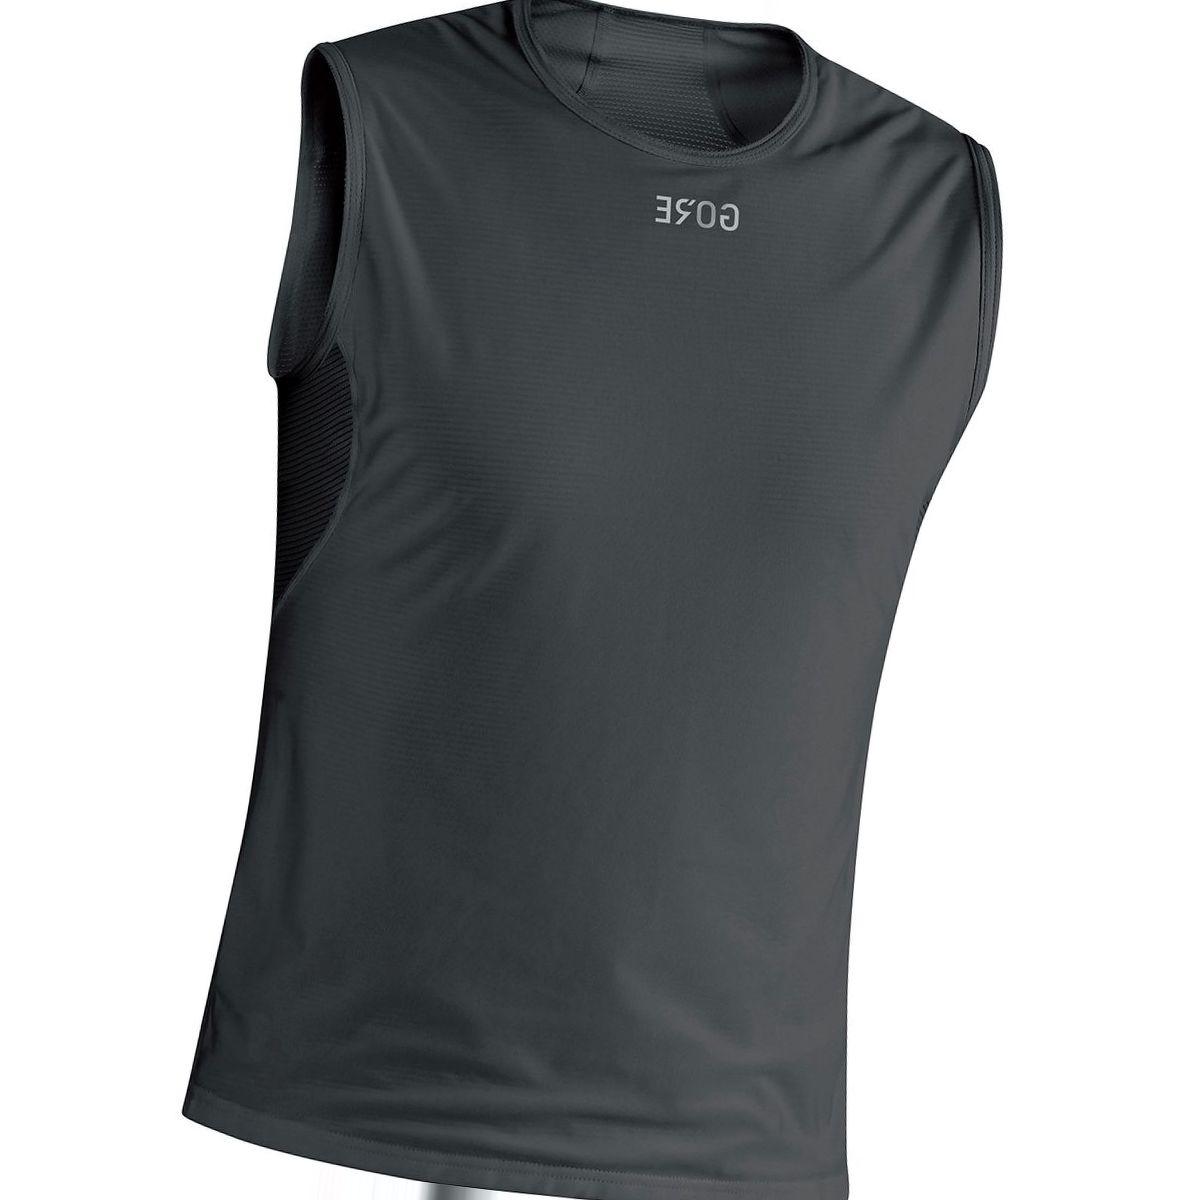 Gore Wear Windstopper Base Layer Sleeveless Shirt - Men's